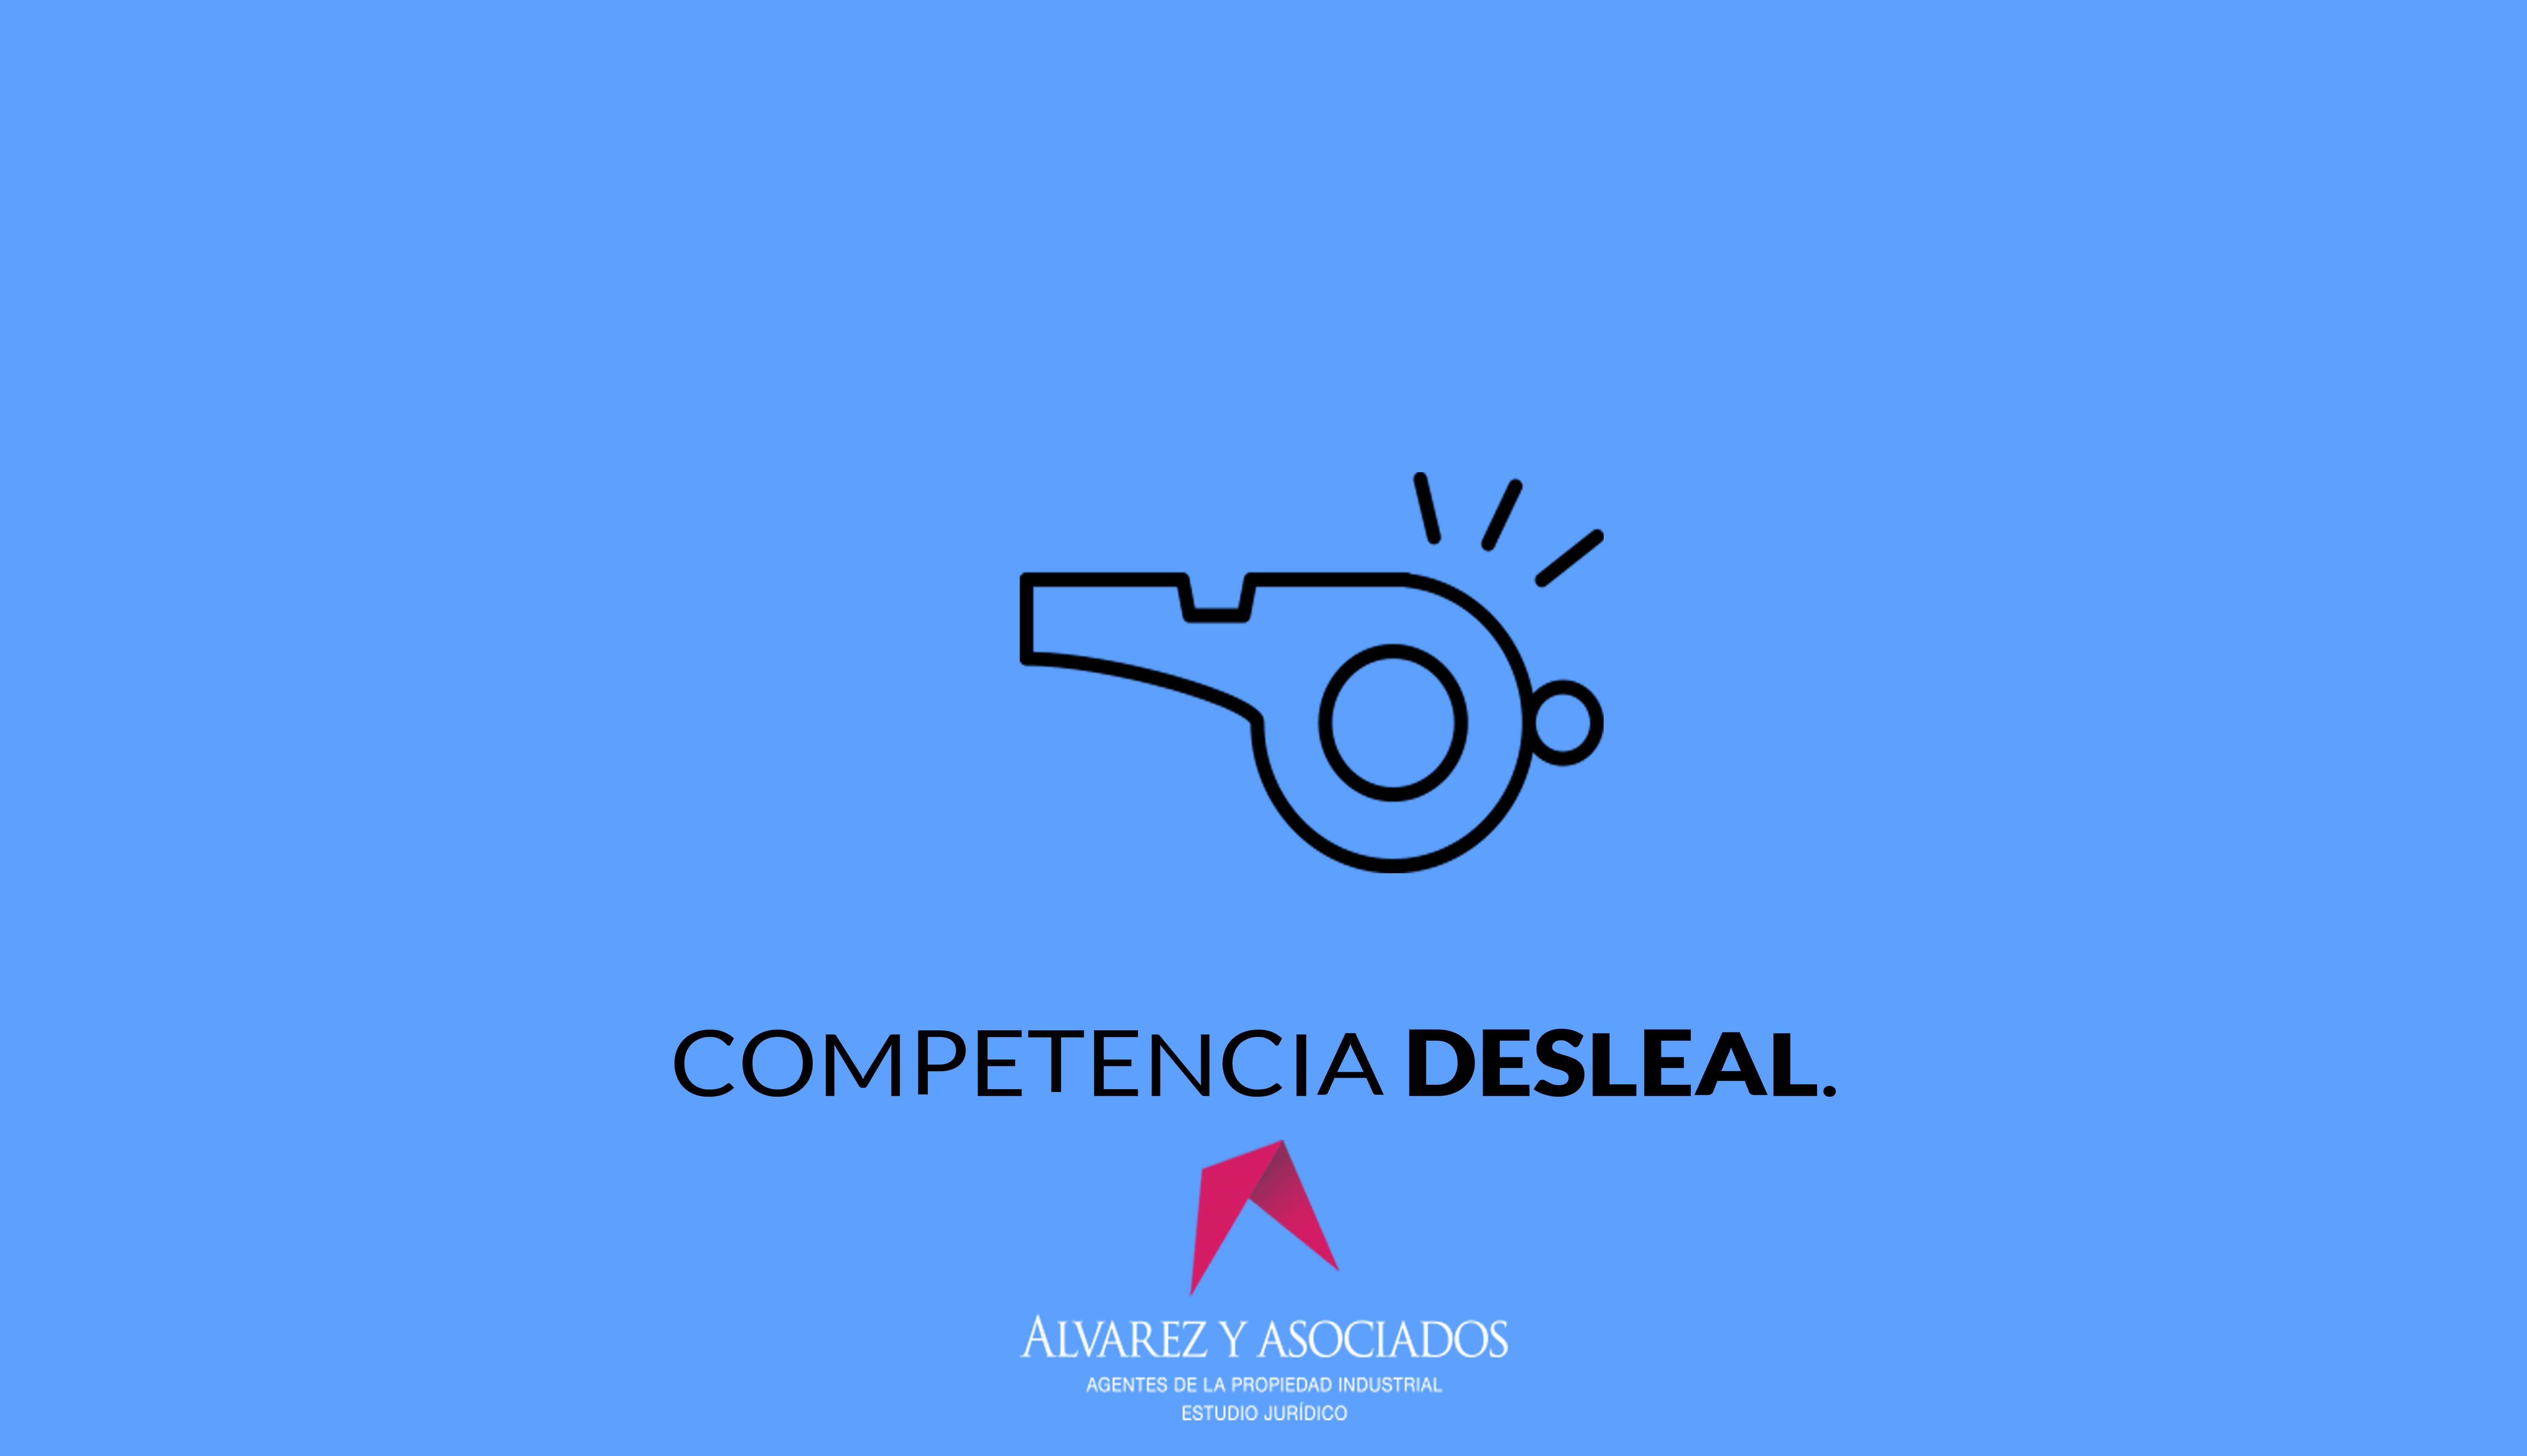 competencia-desleal-600-300-min